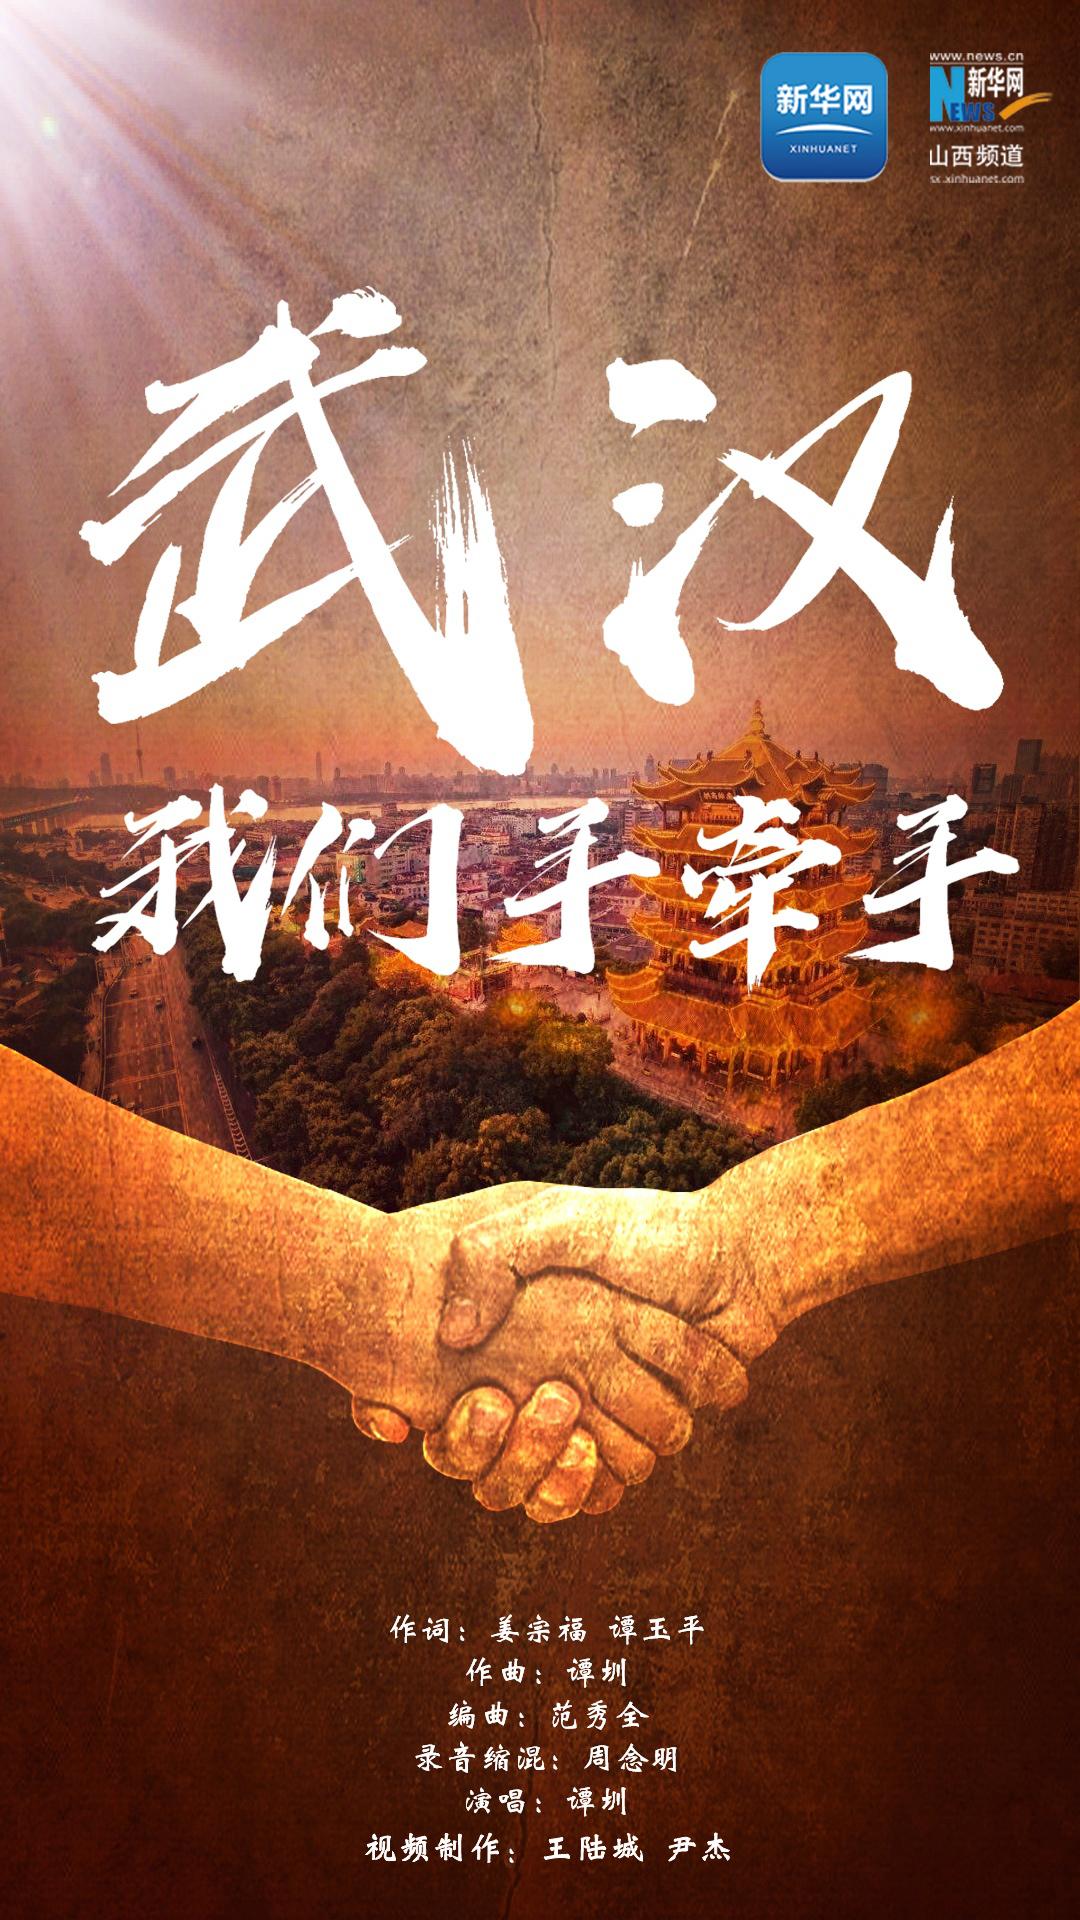 MV|武汉我们手牵手